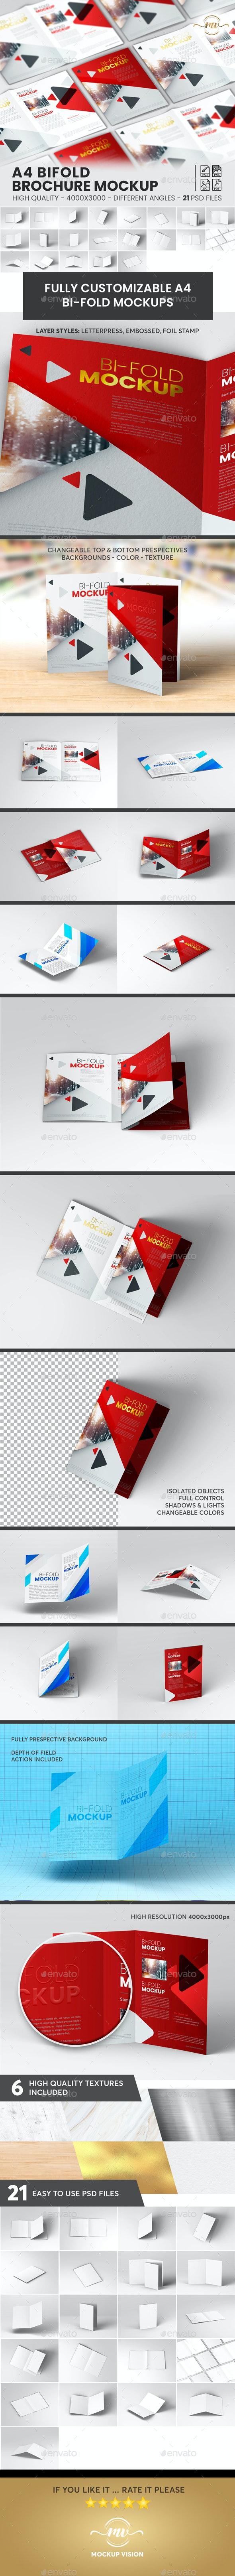 A4 Bifold, Brochure Mockup V1 - Brochures Print